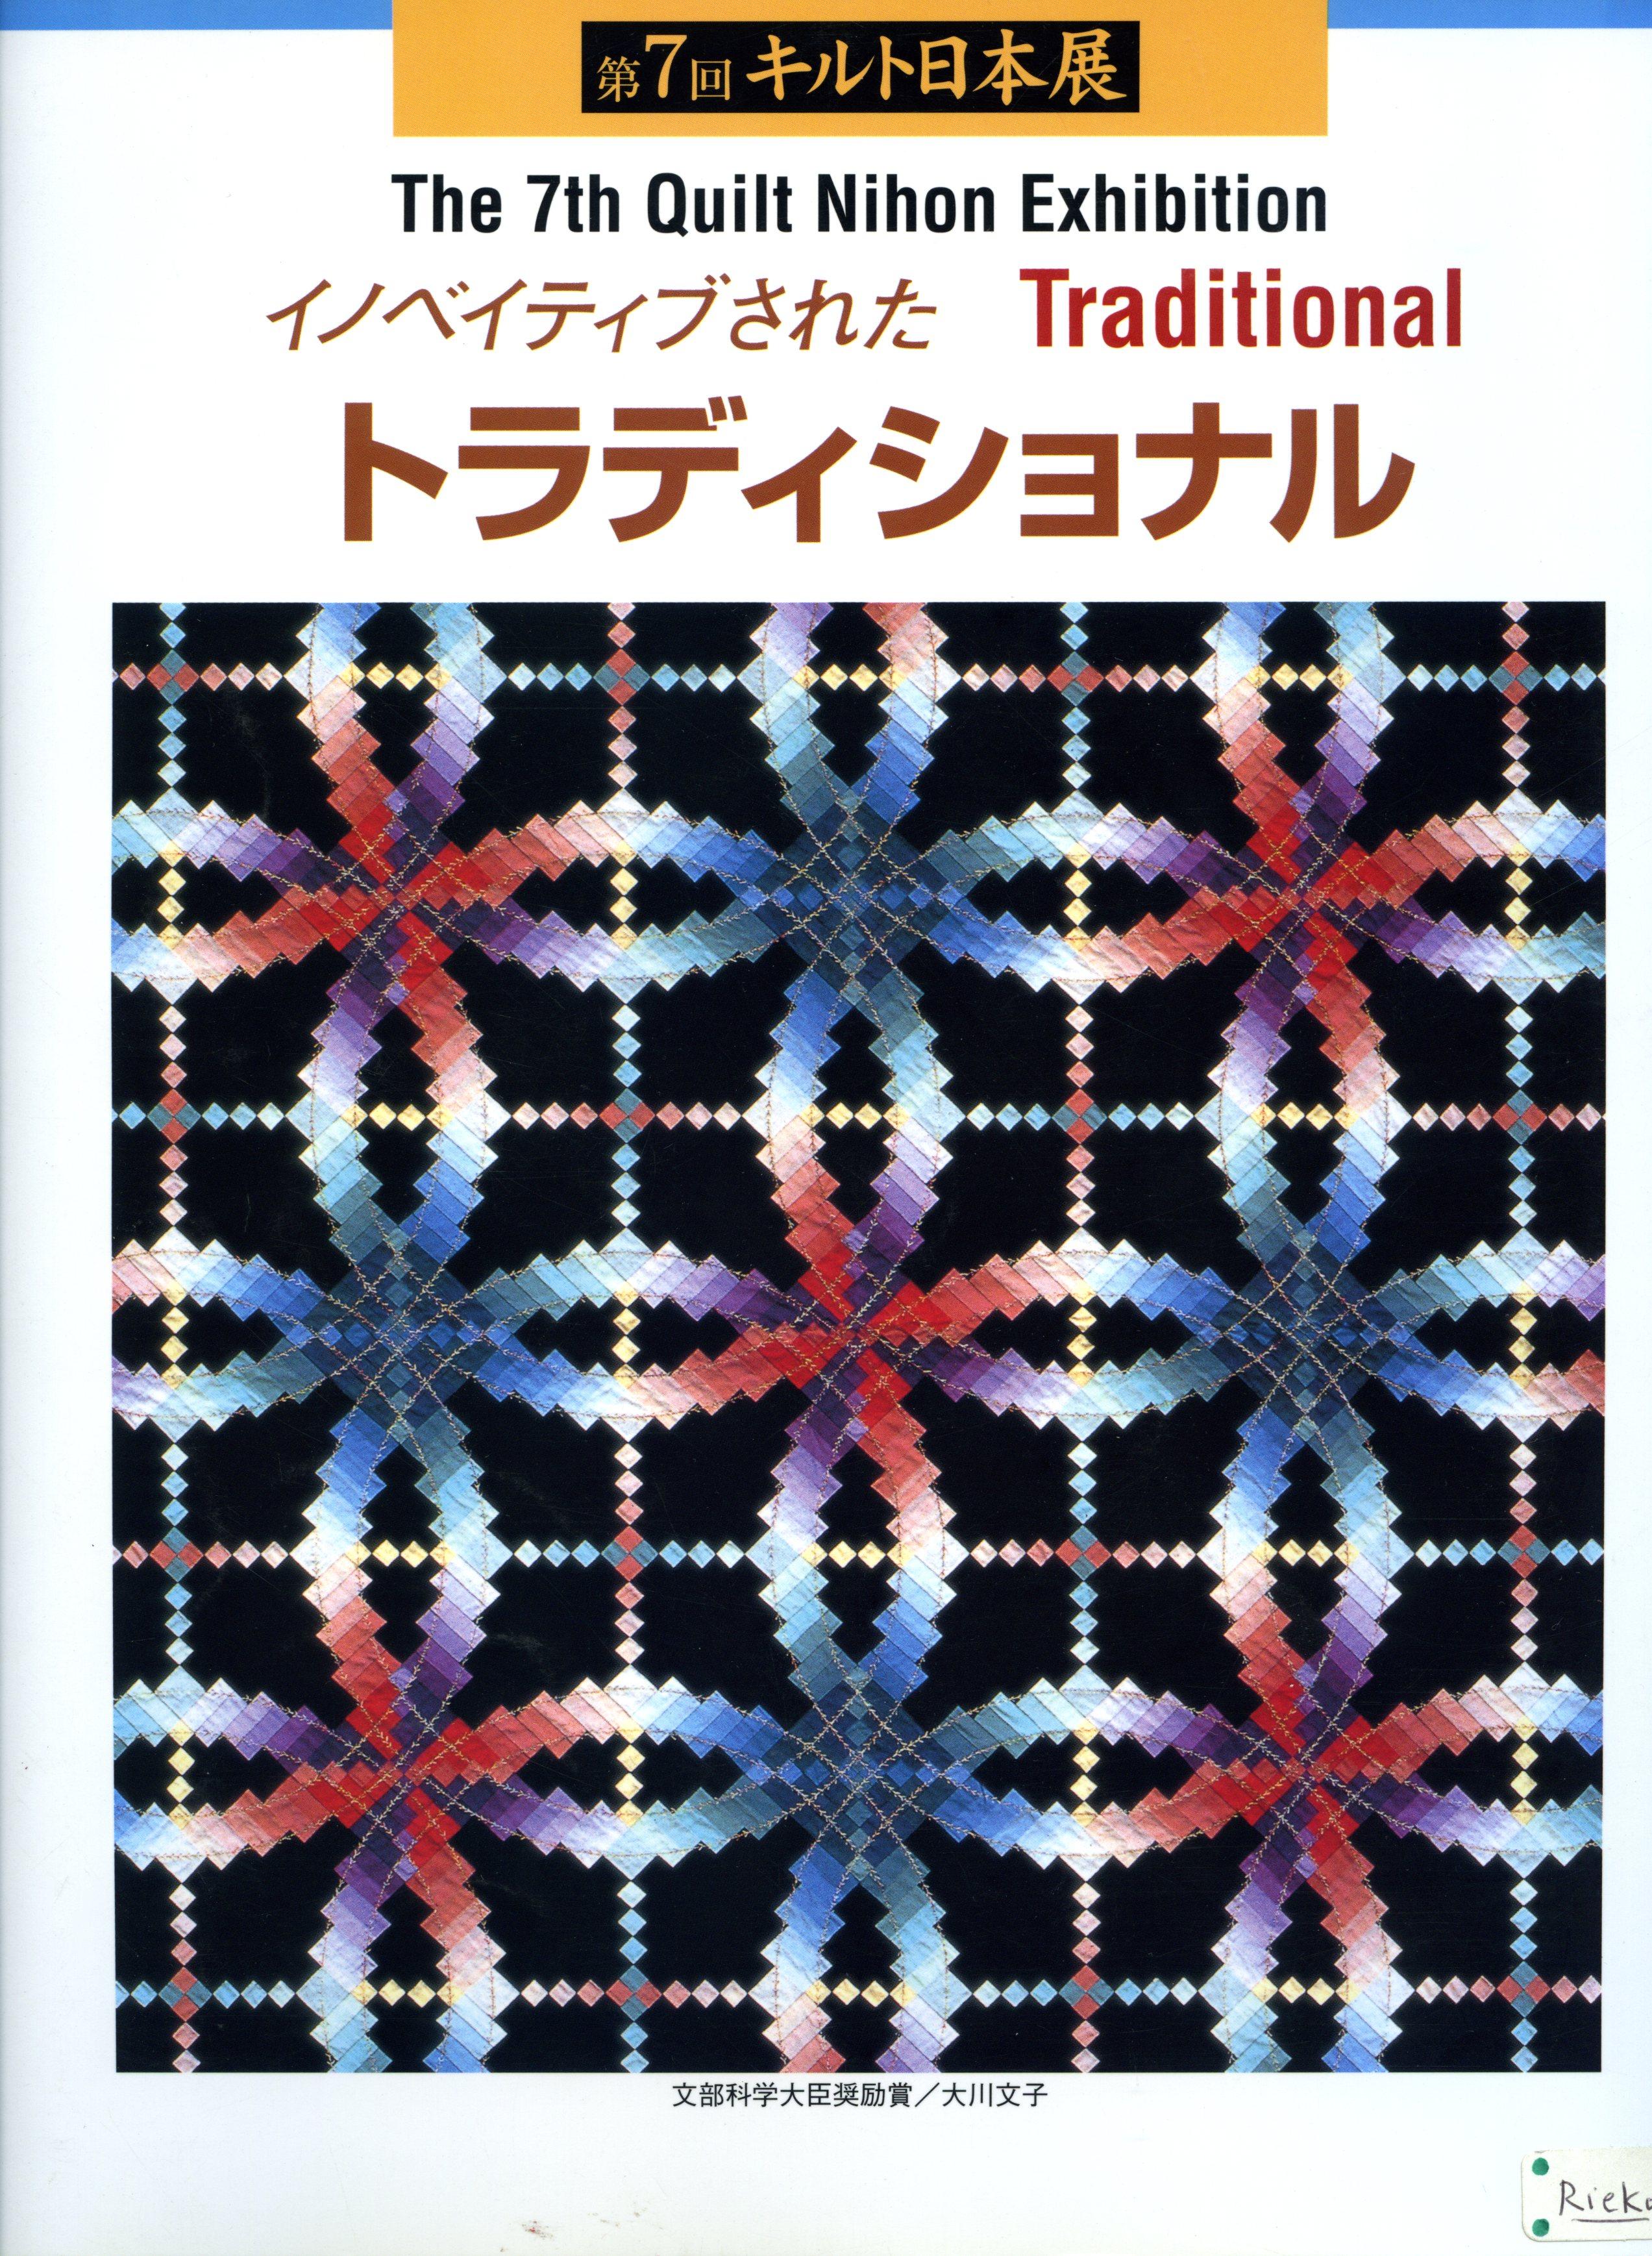 Nihon Exibition 2002中沢フェリーサ